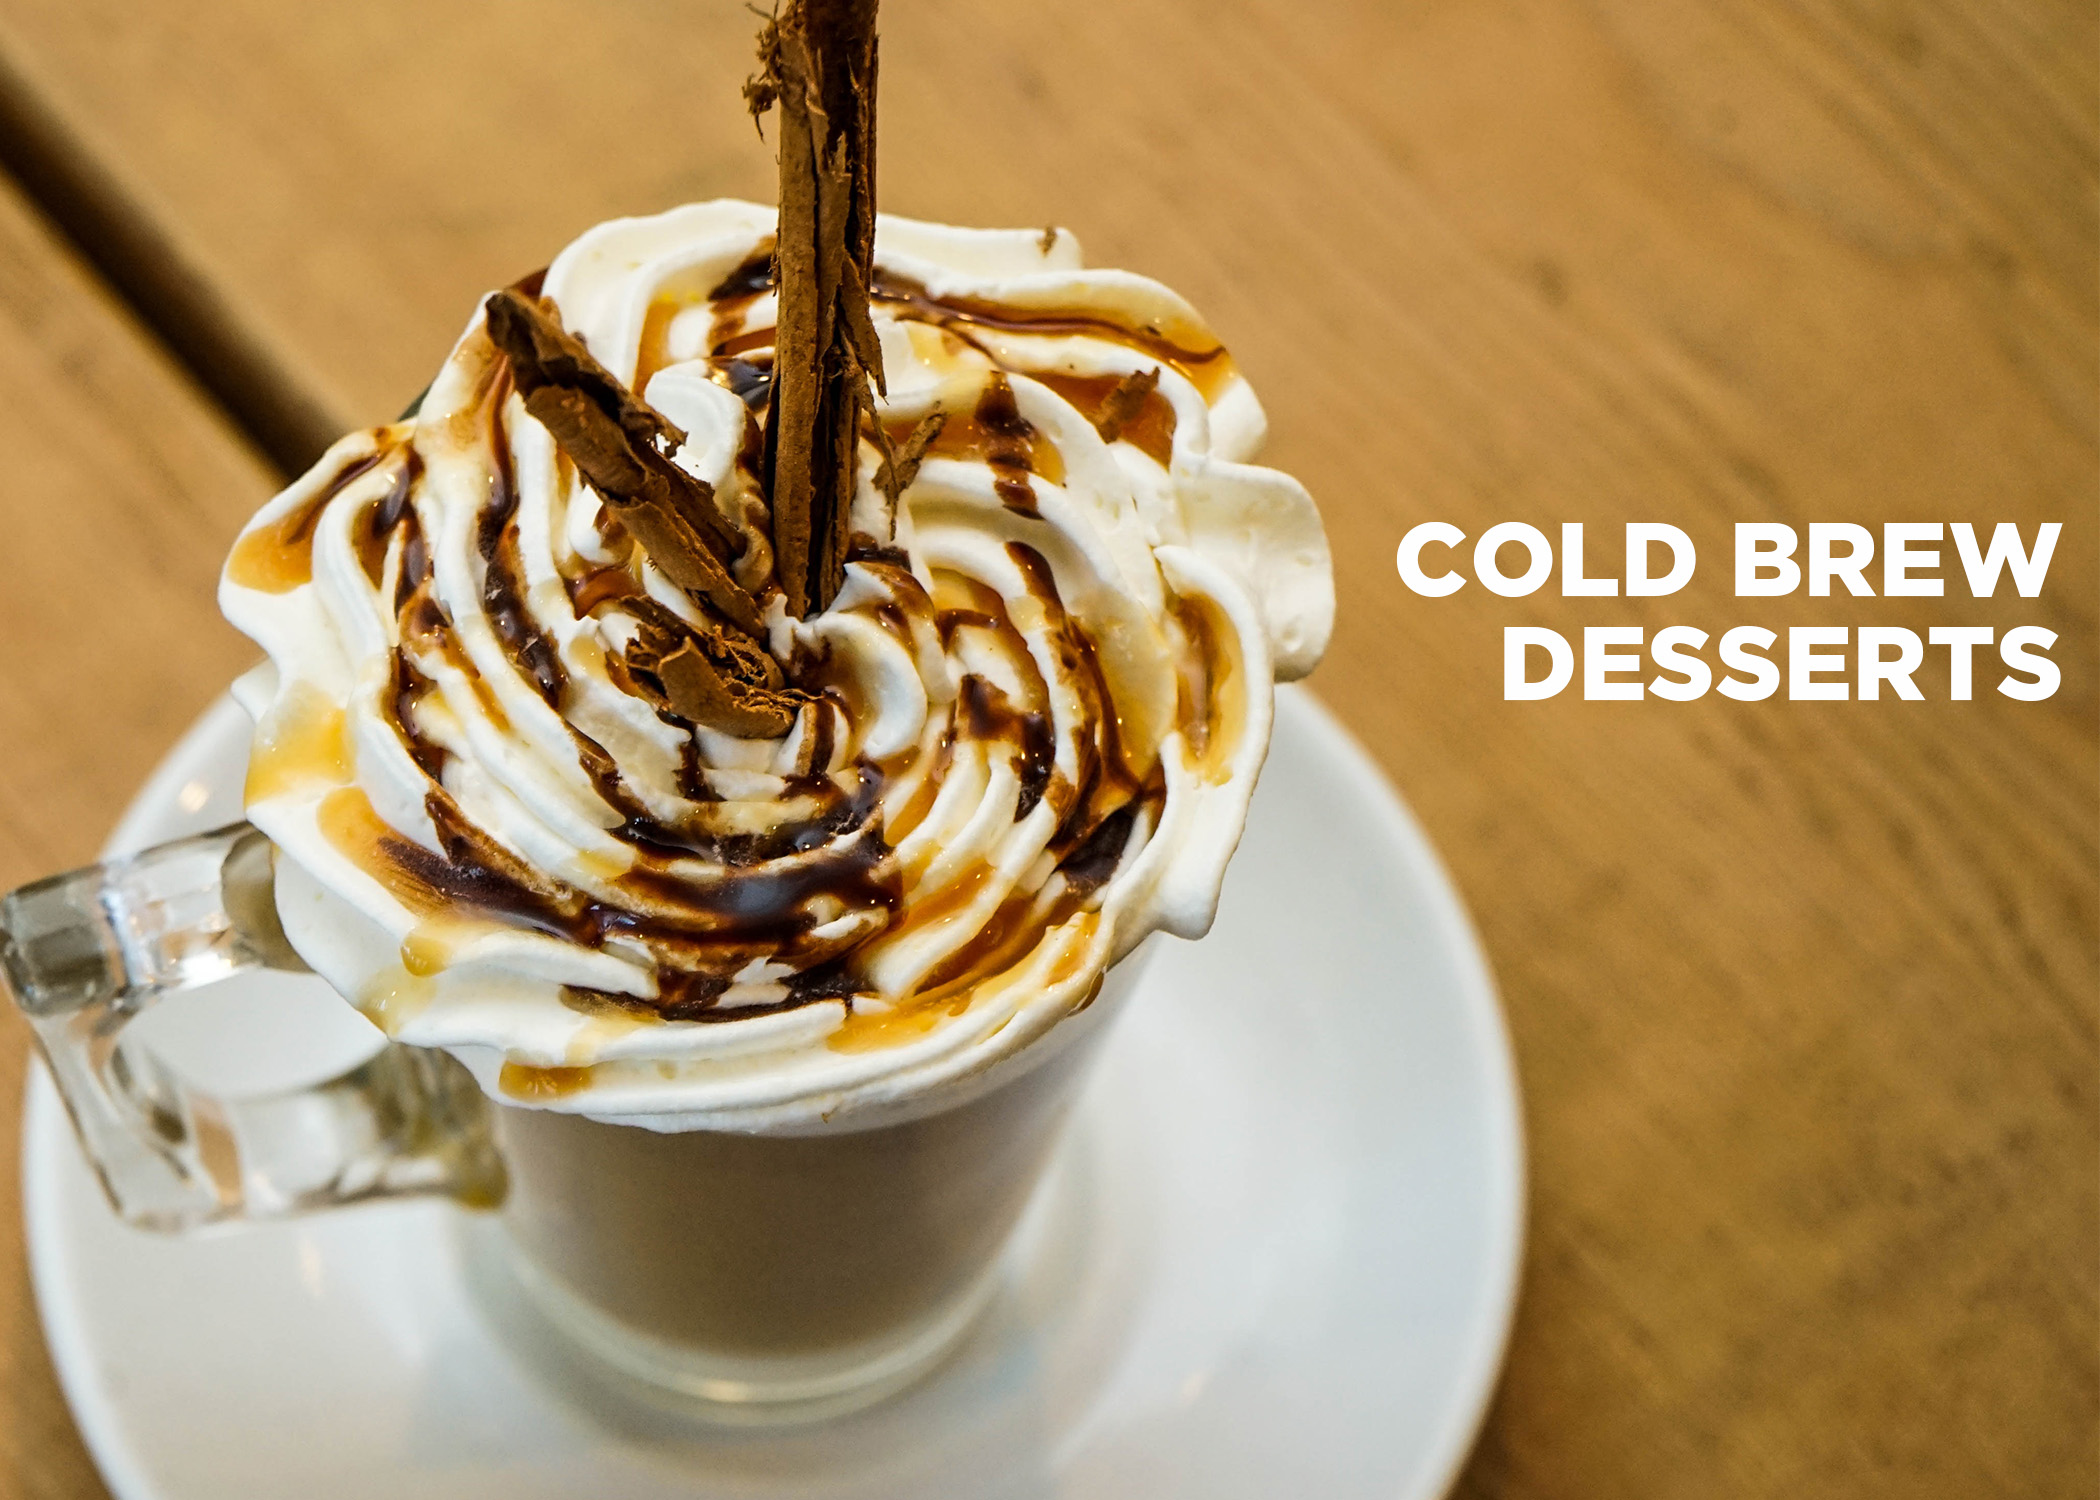 coldbrewdesserts